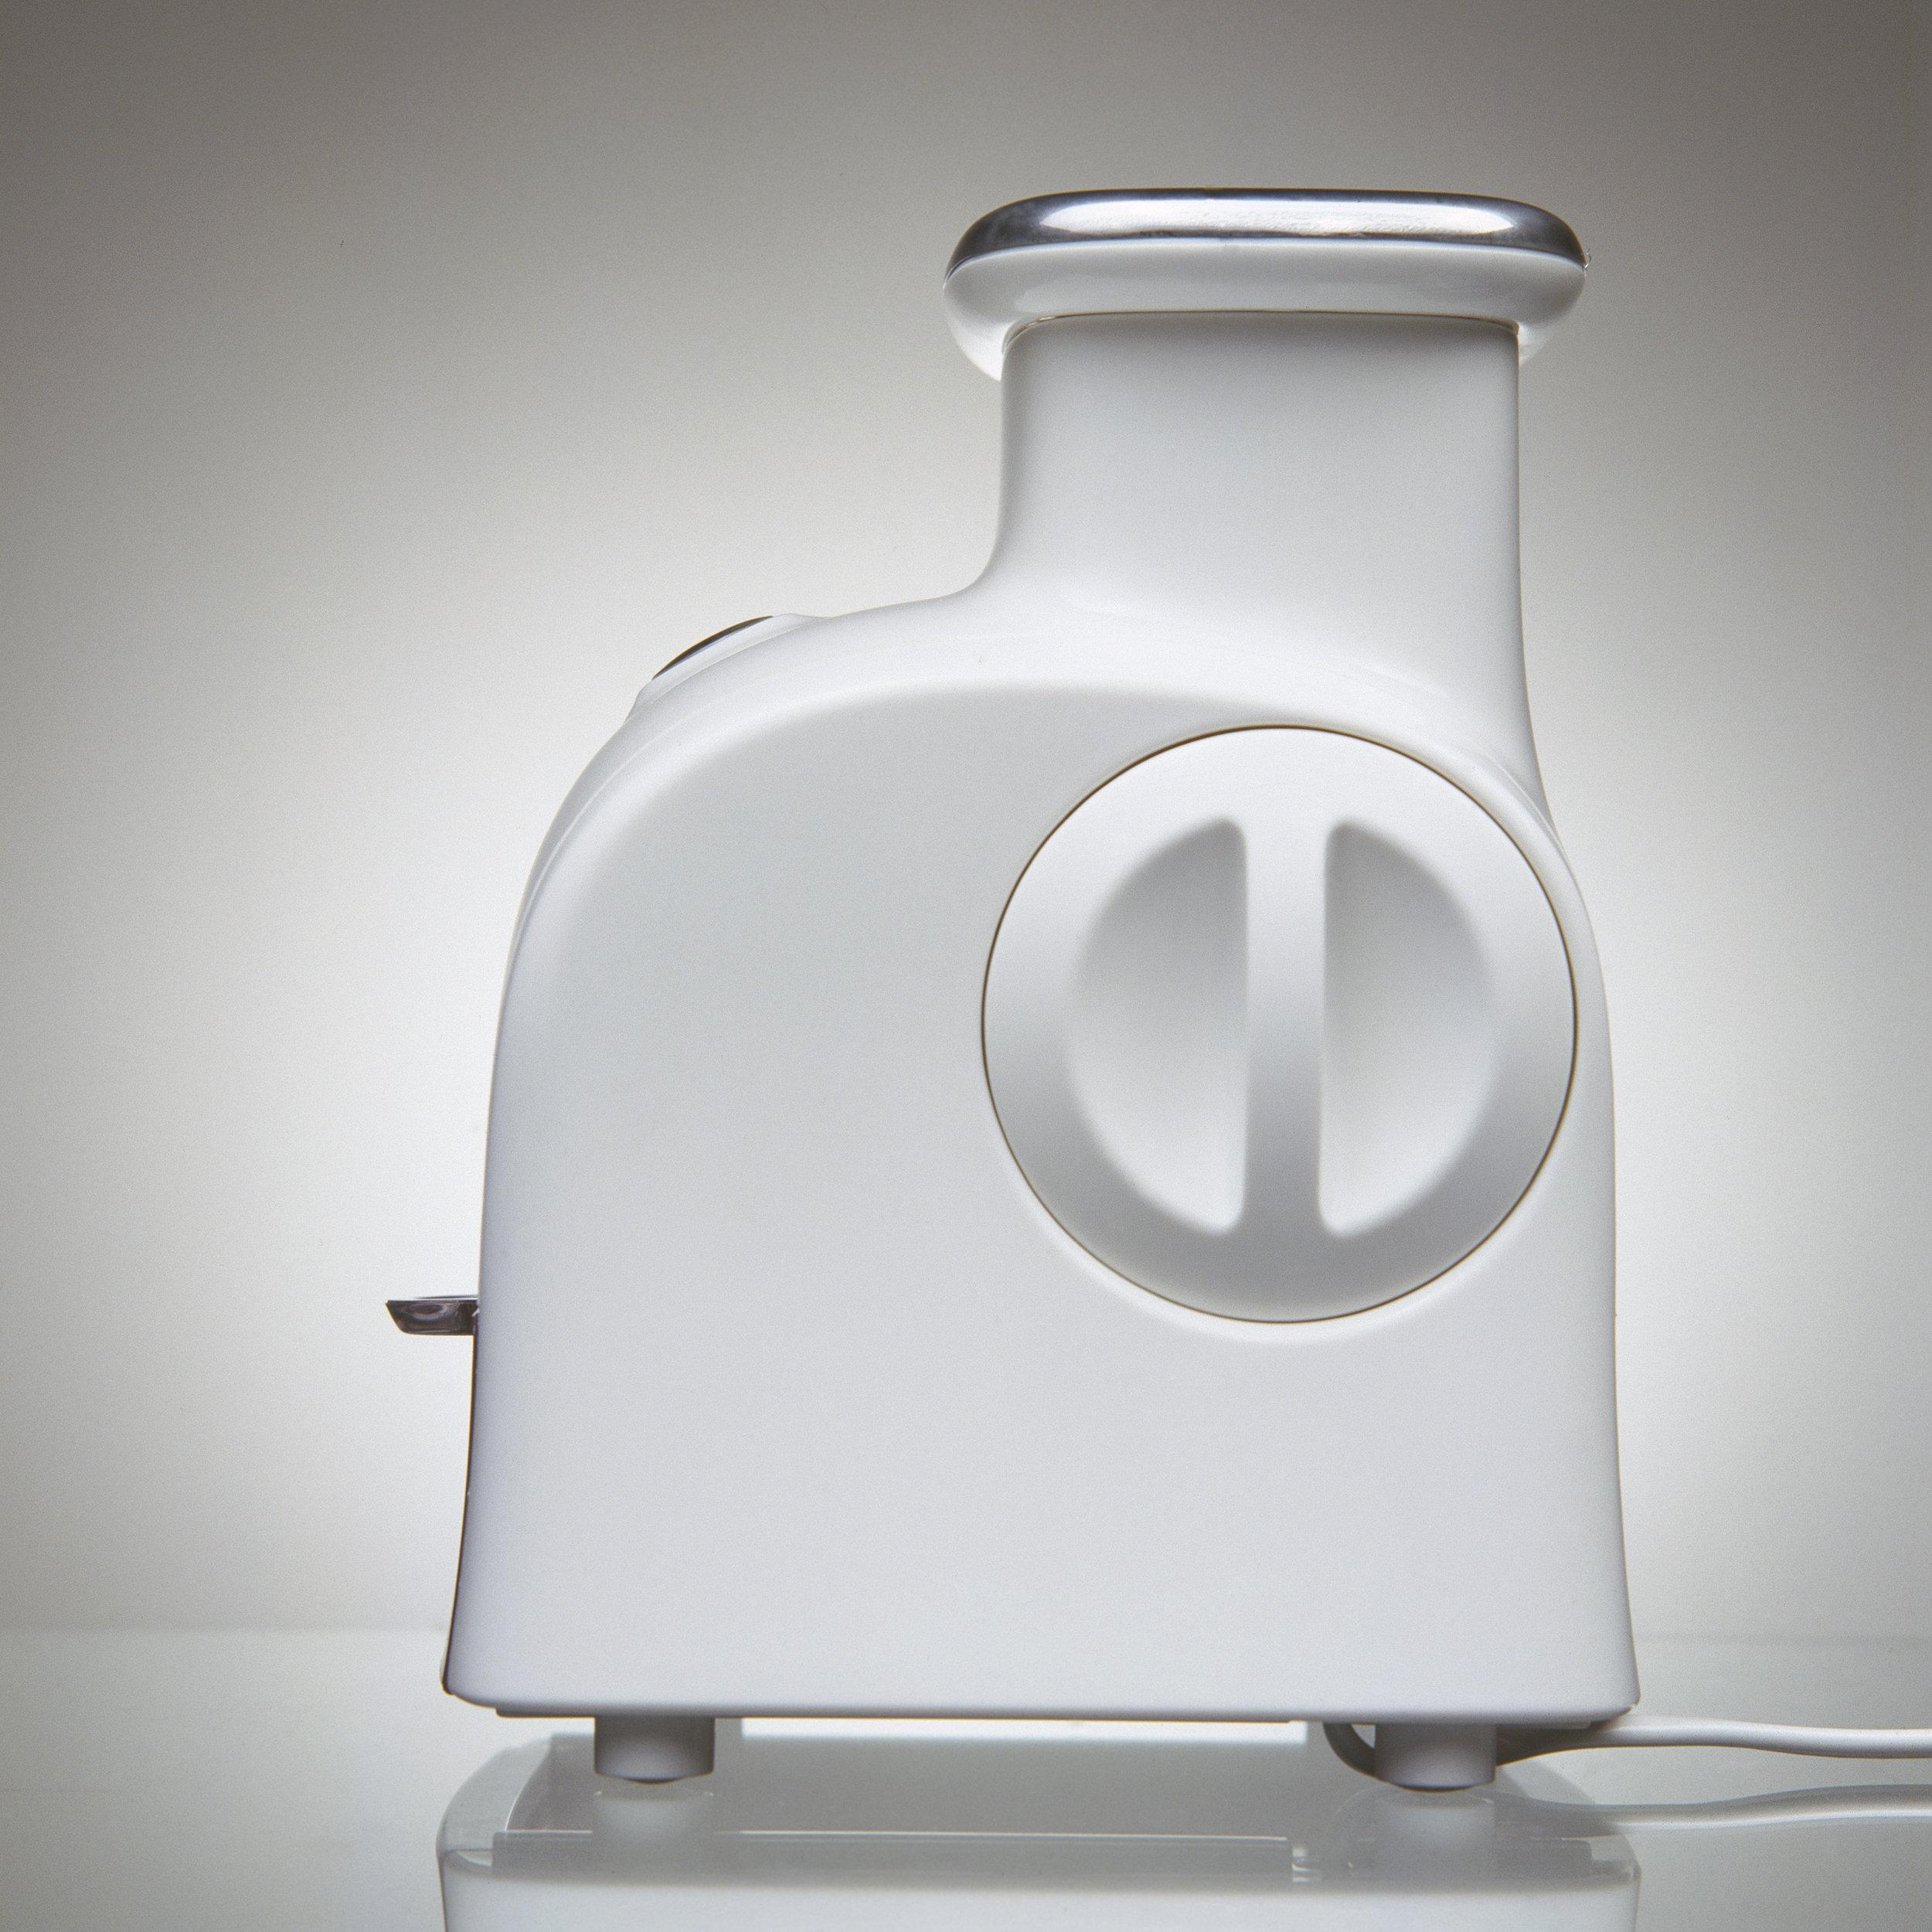 Guzzini_kitchenAppliances_IlvioPhotos_HighRes_009.jpg